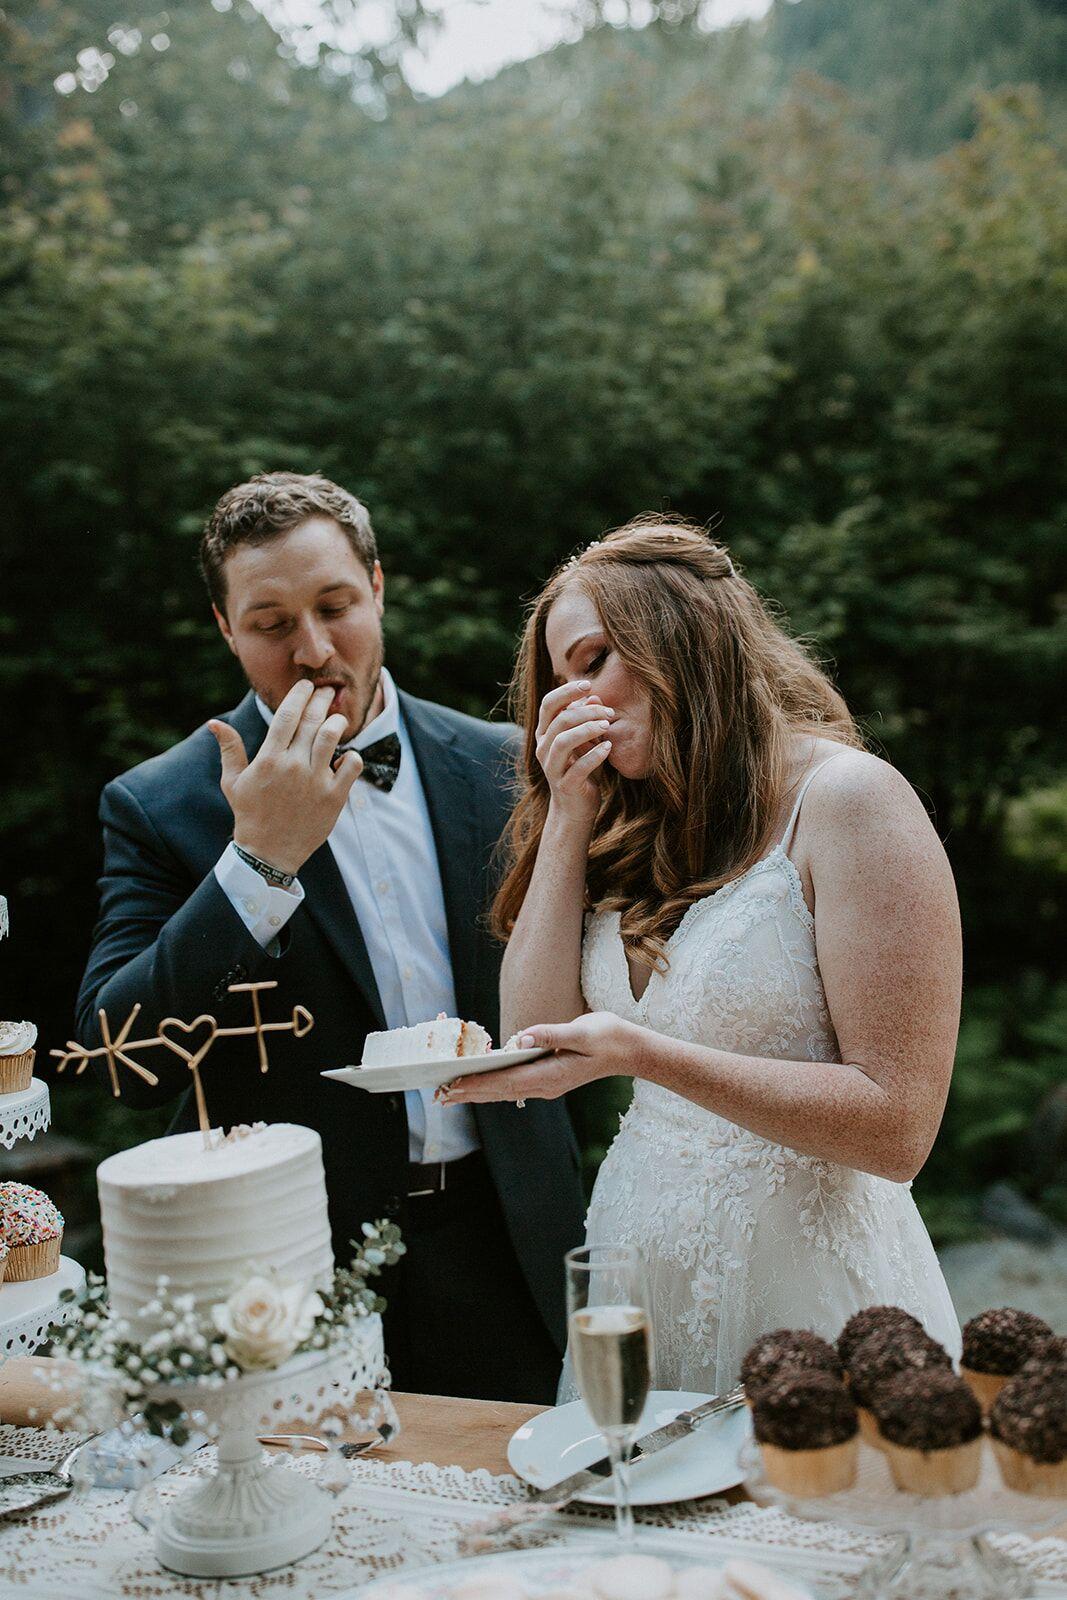 Blue-Sky-Ranch-Wedding-Block-Weddings-and-Events37.jpeg